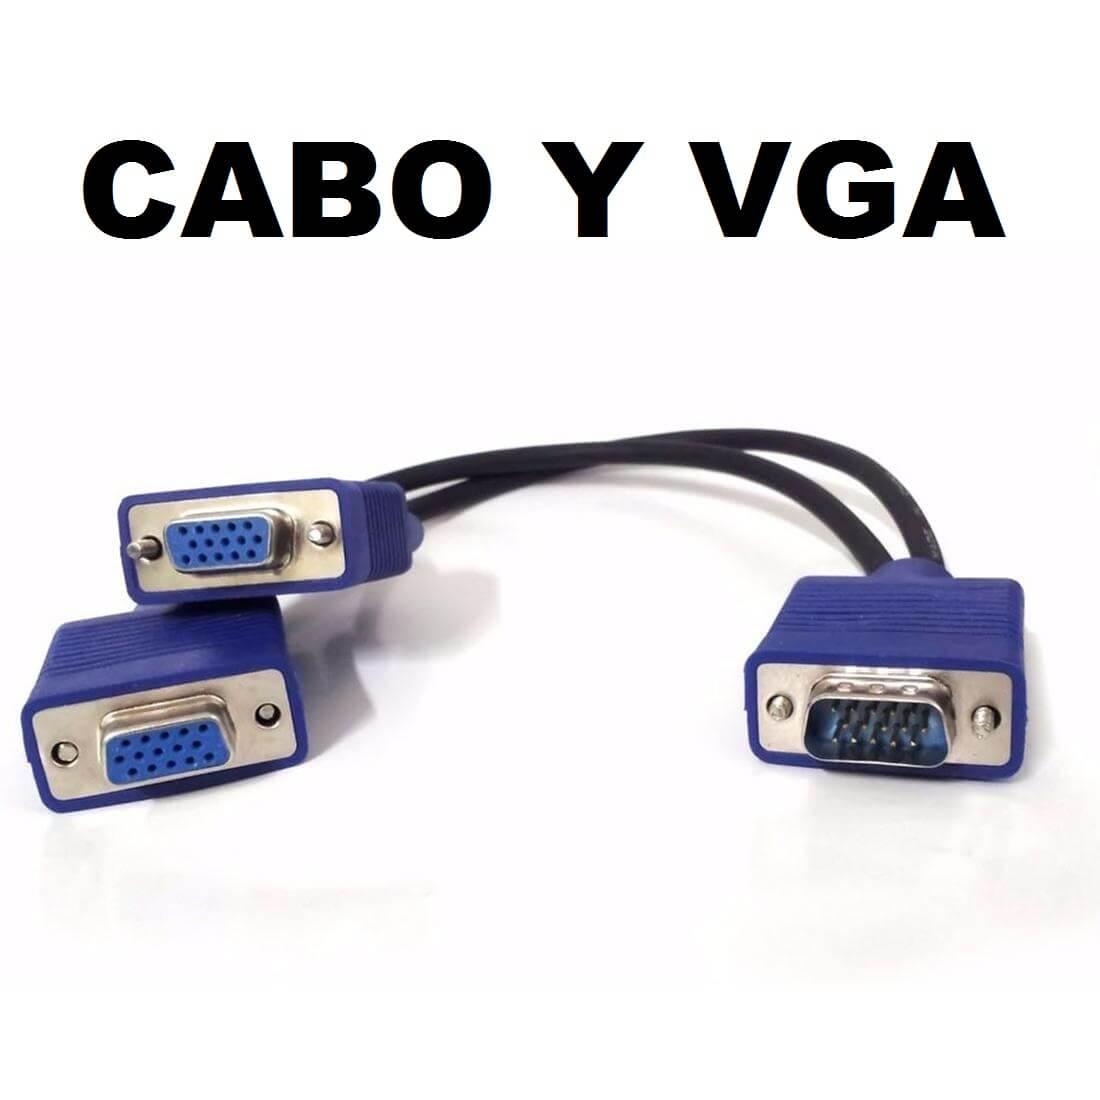 Cabo VGA em Y 1 Vga Macho para 2 Vga Fêmea